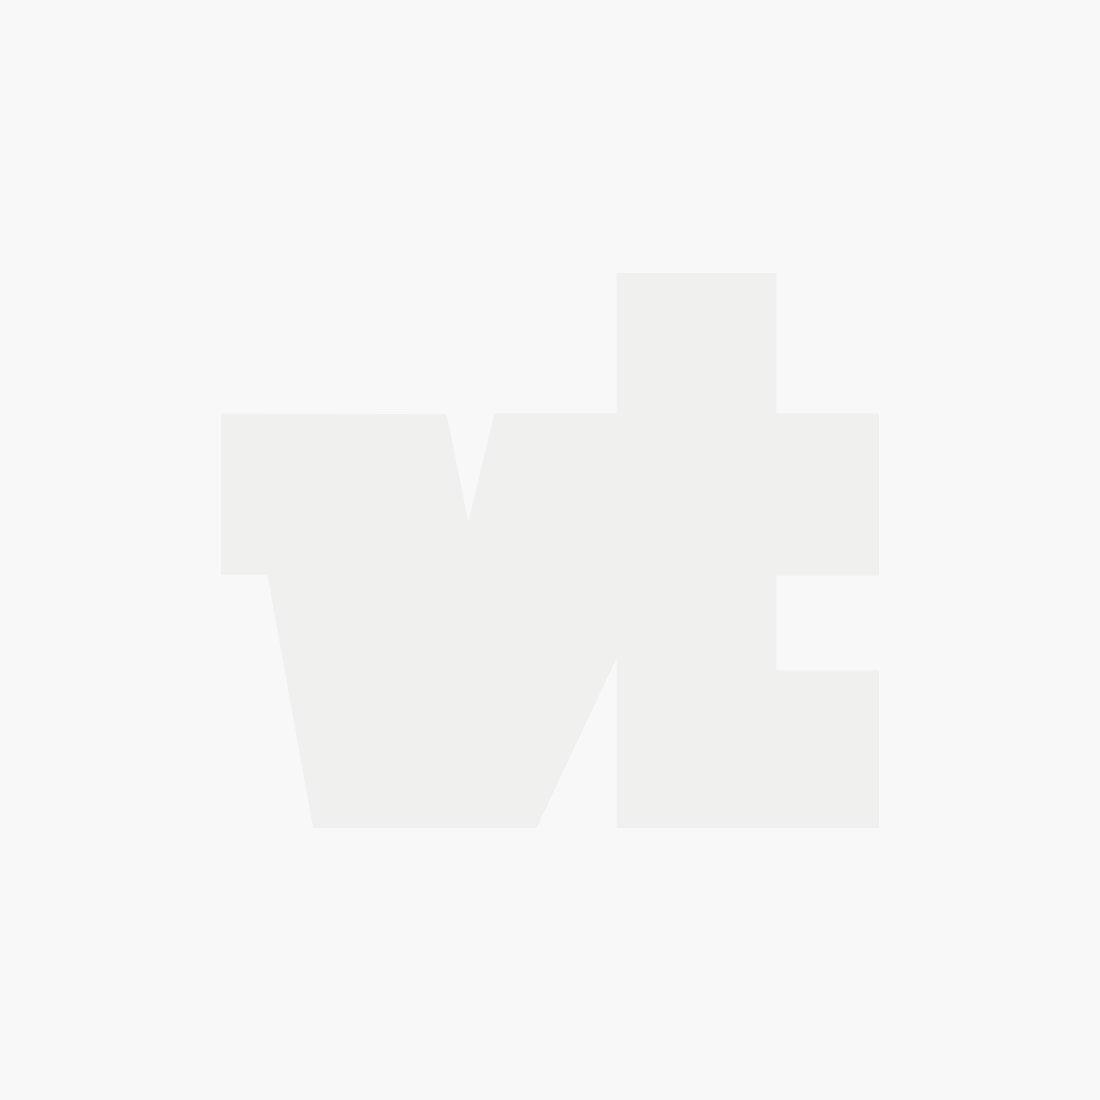 Sneaker running blue ink 7073